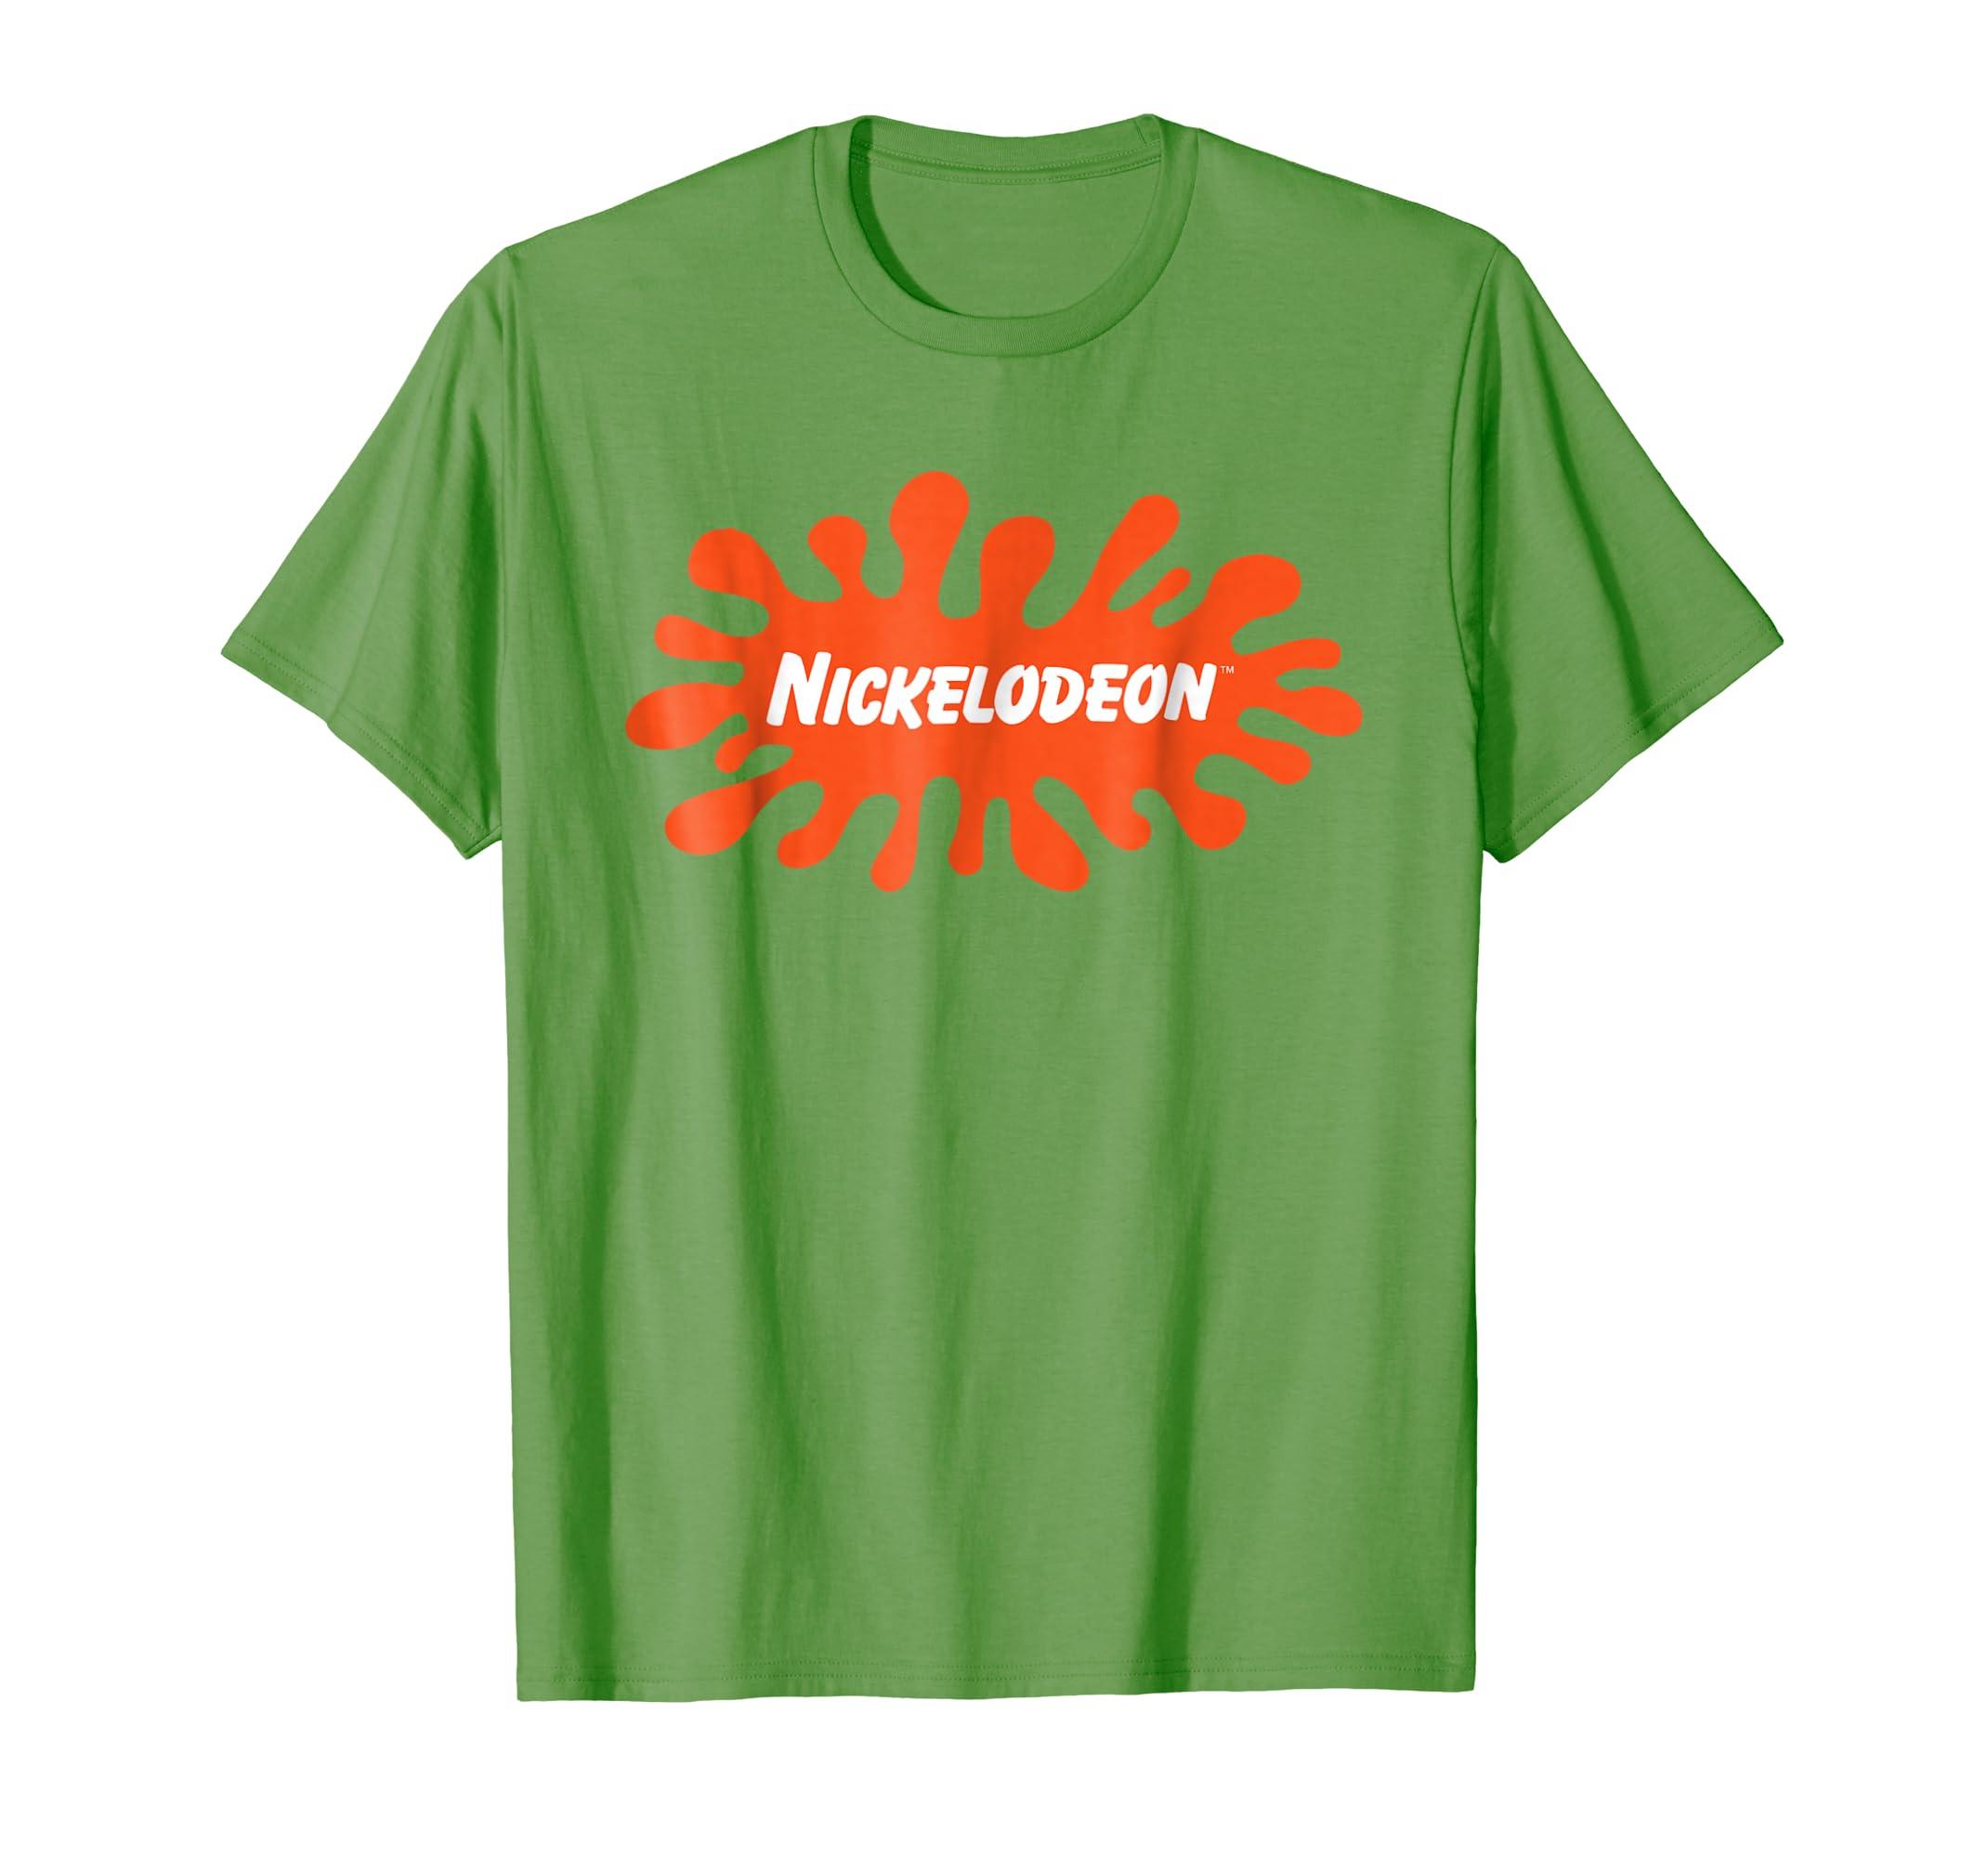 9f3a97f9e Amazon.com: Nickelodeon Splat Logo T-Shirt: Clothing